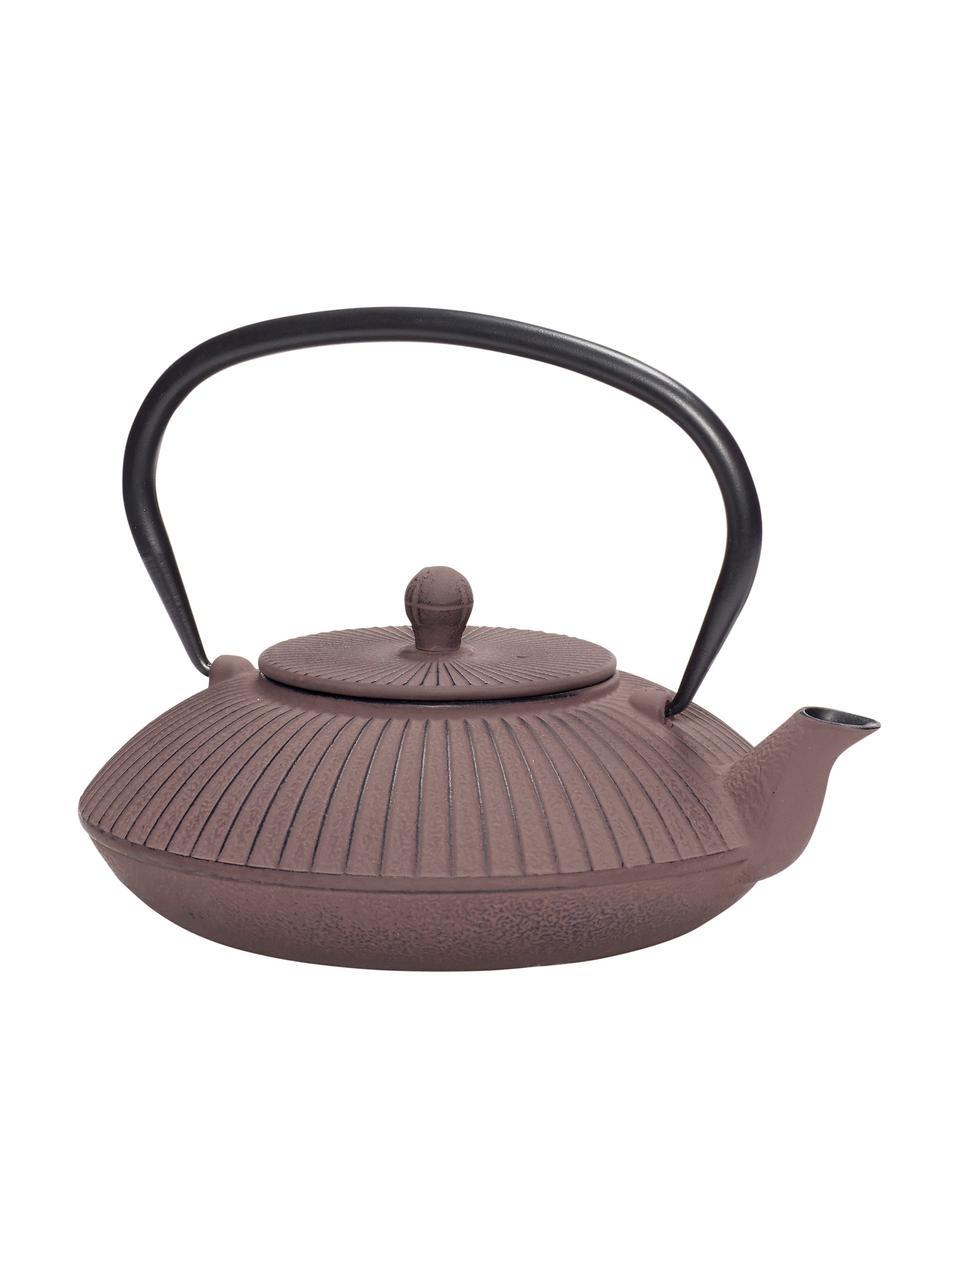 Teekanne Ala, 1.1 L, Metall, beschichtet, Teekanne: PflaumenfarbenGriff: Schwarz, 1.1 L